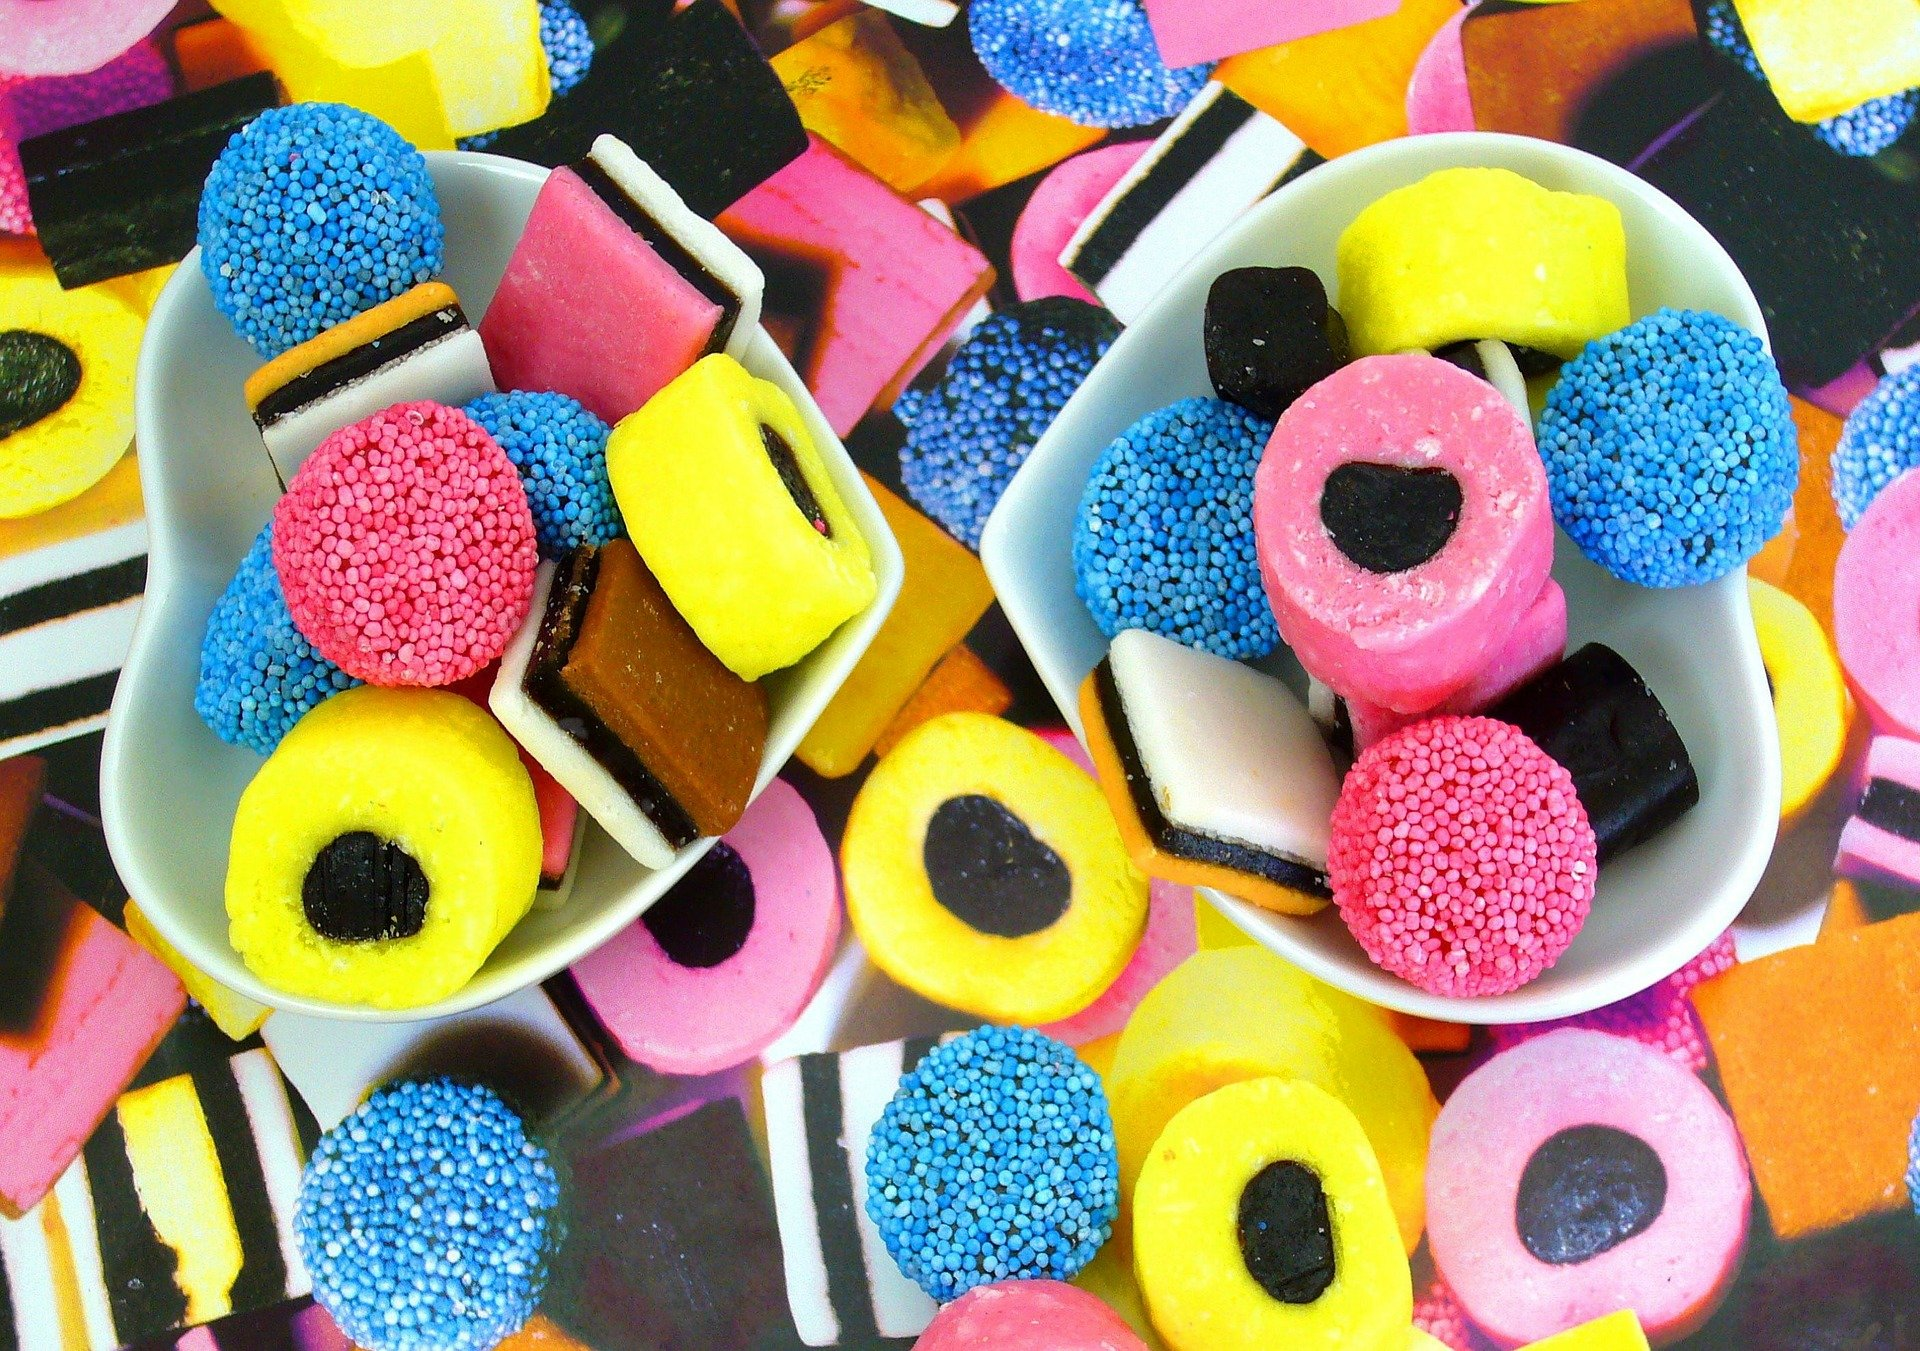 Black licorice candy